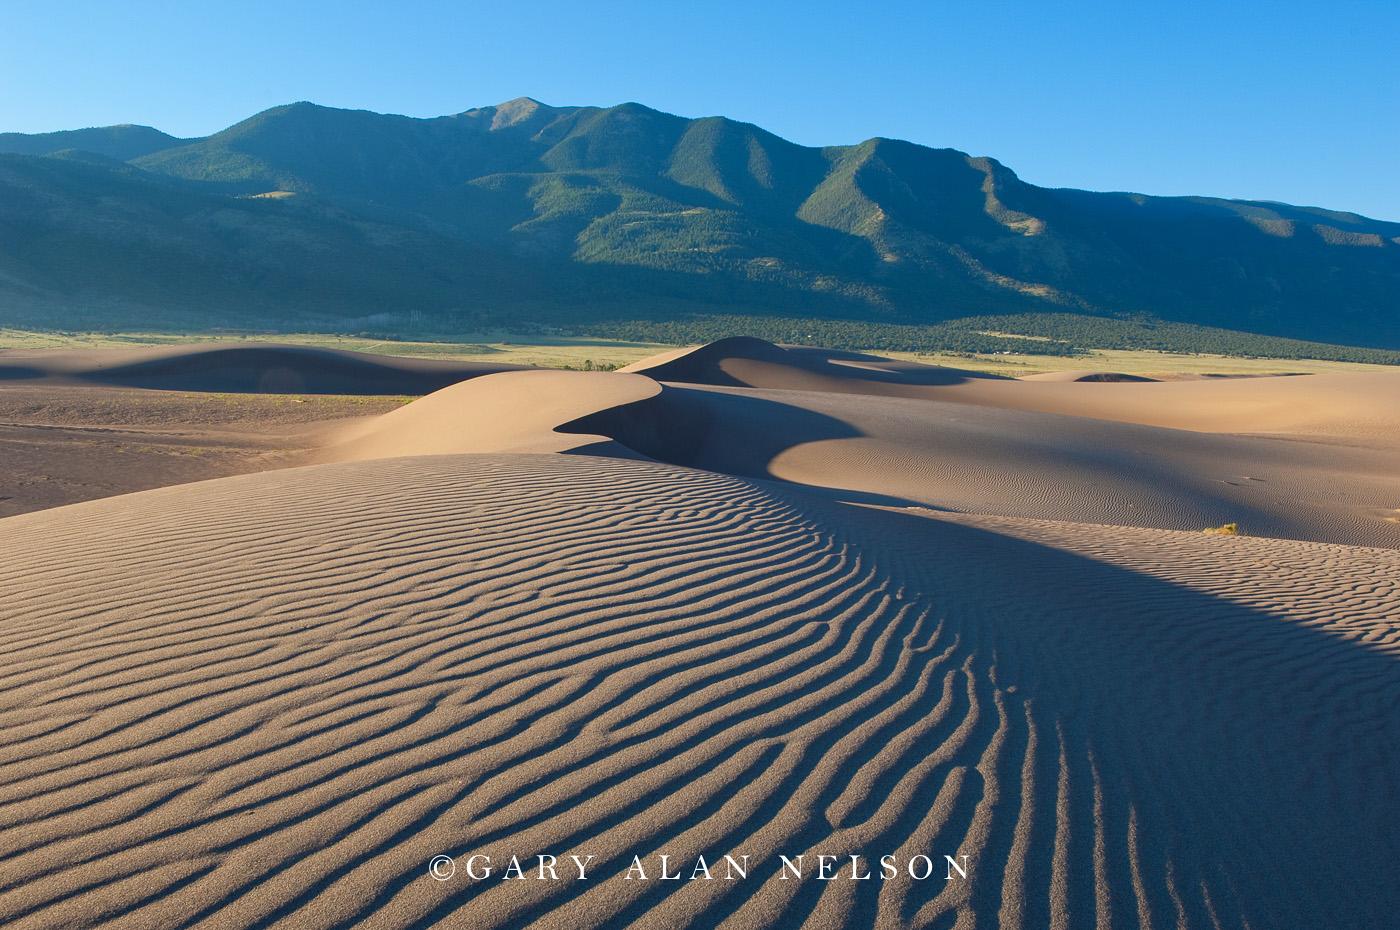 national park, great sand dunes, sand dunes, colorado, photo